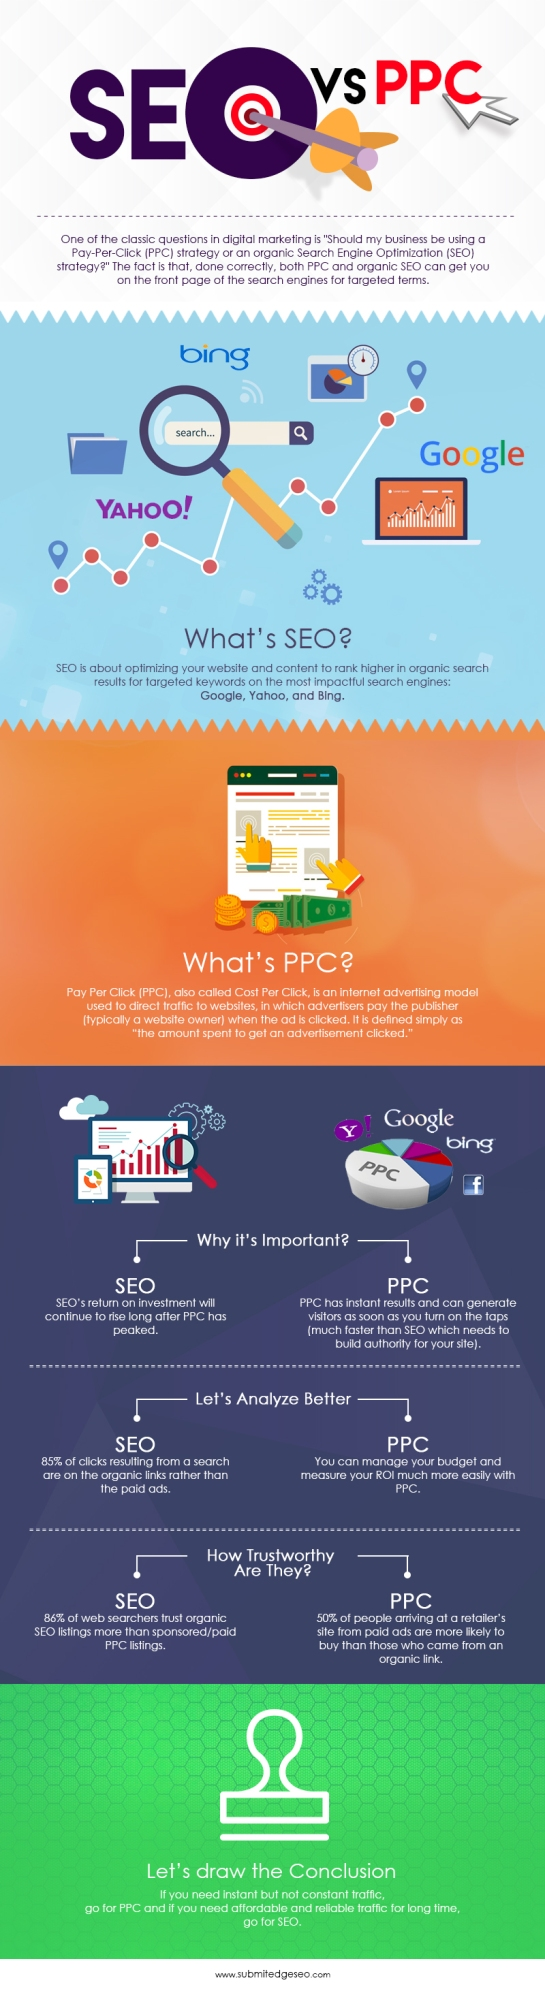 SEO vs PPC - Blog SEO - AUTOVEILLE